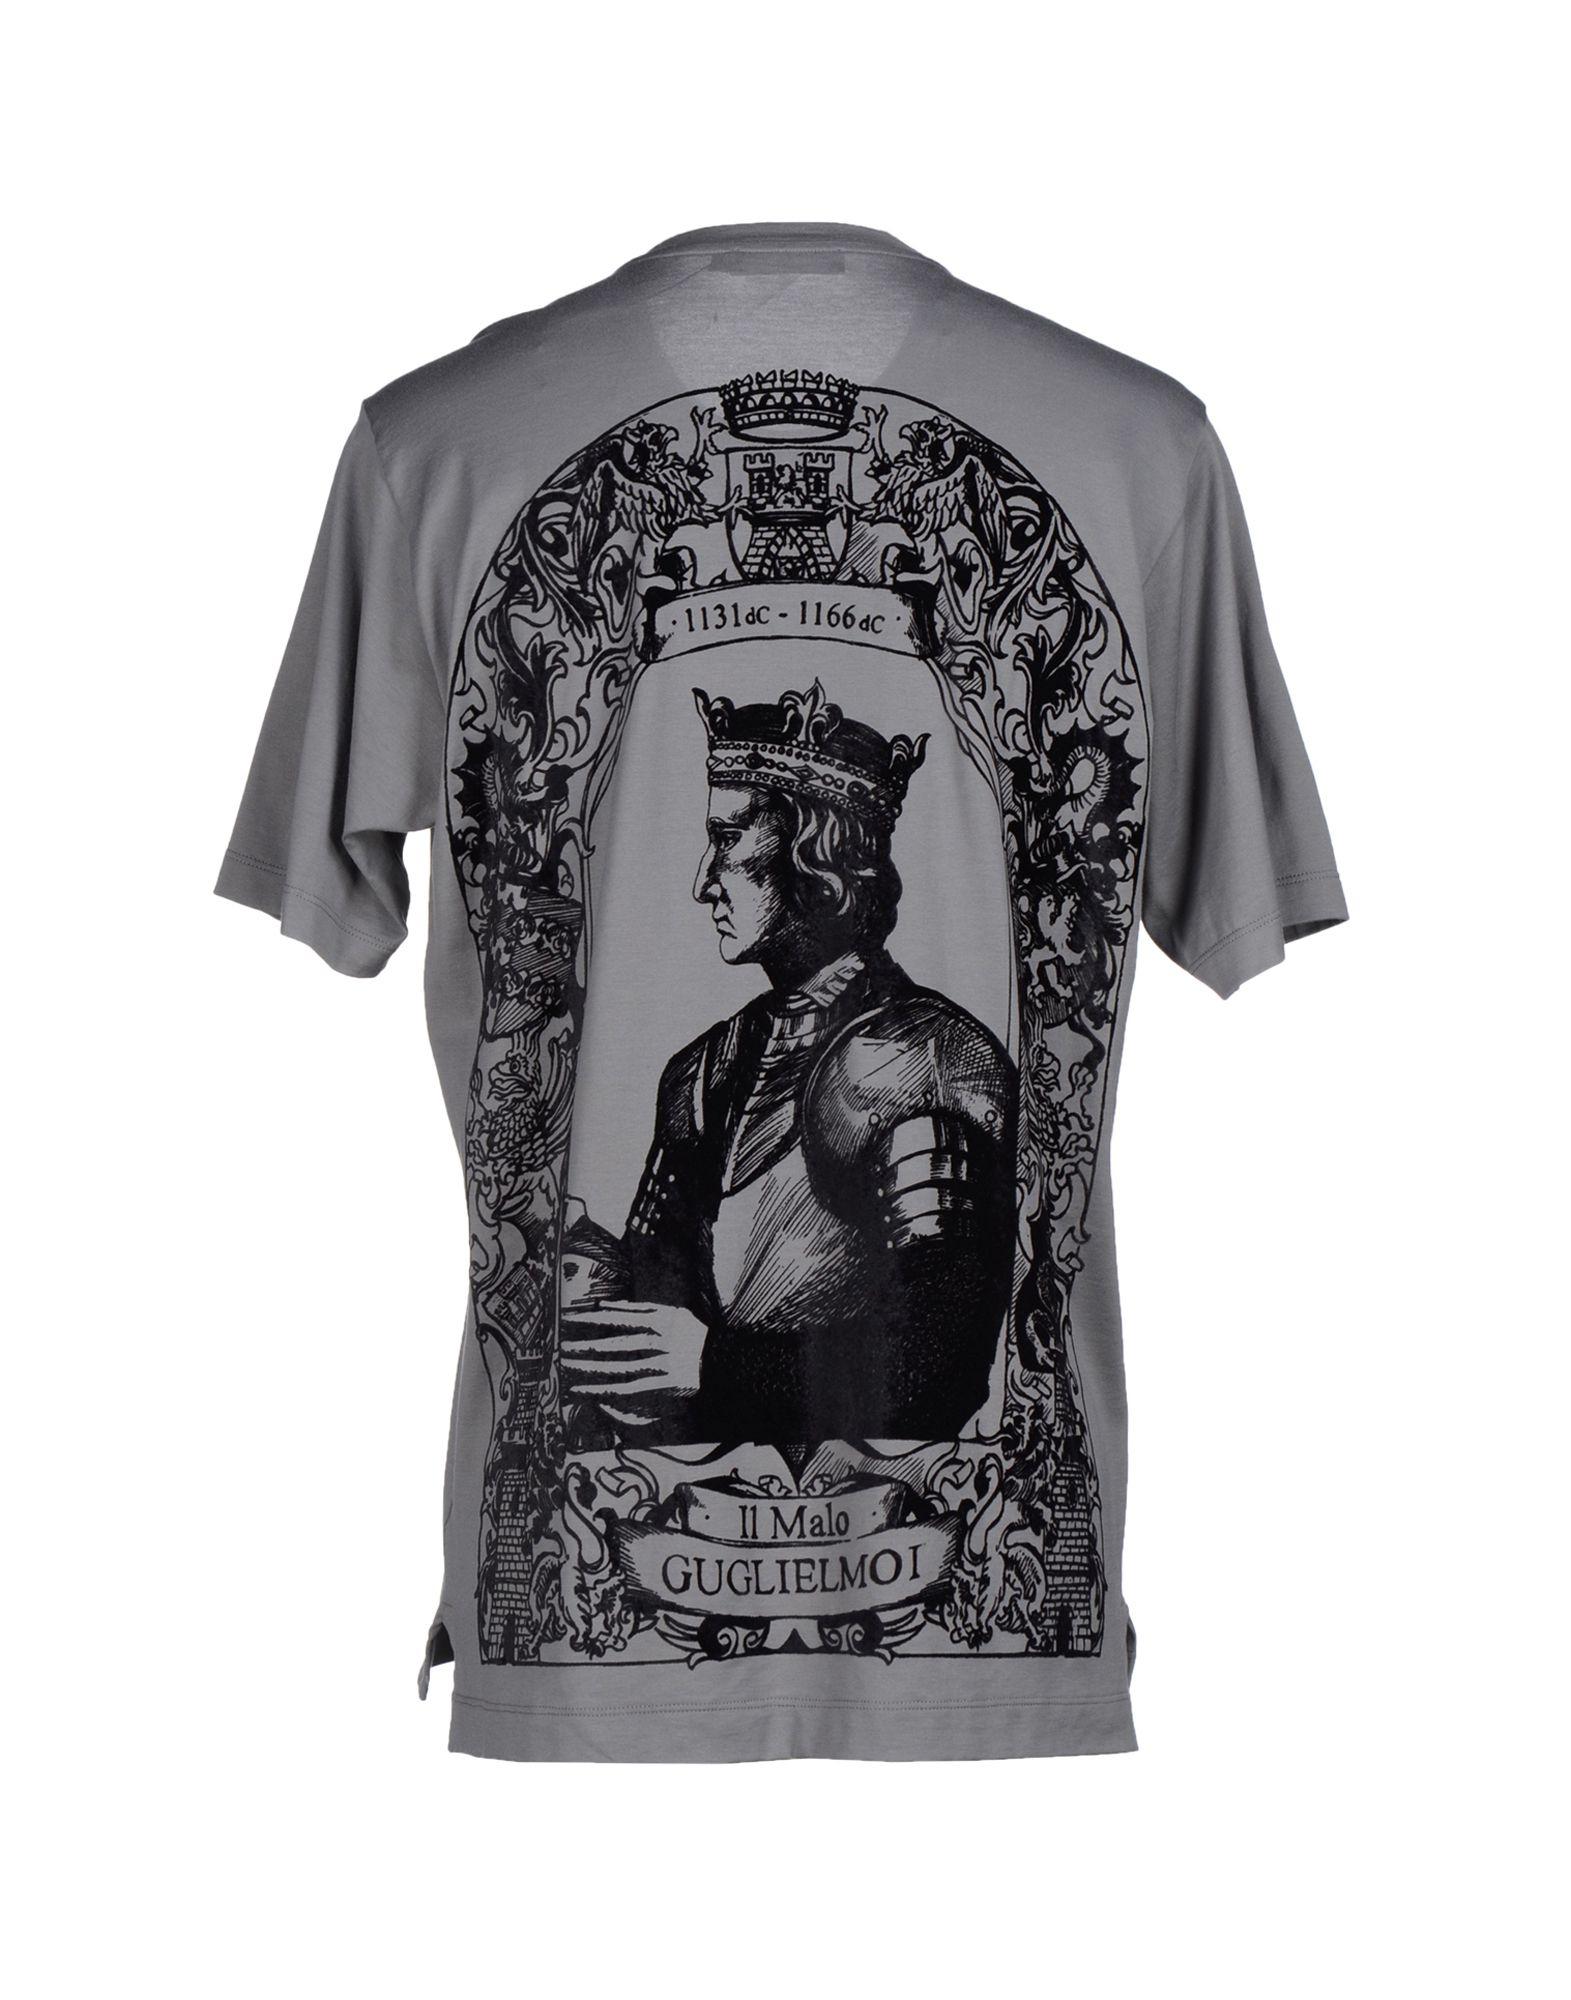 dolce gabbana t shirt in gray for men grey lyst. Black Bedroom Furniture Sets. Home Design Ideas